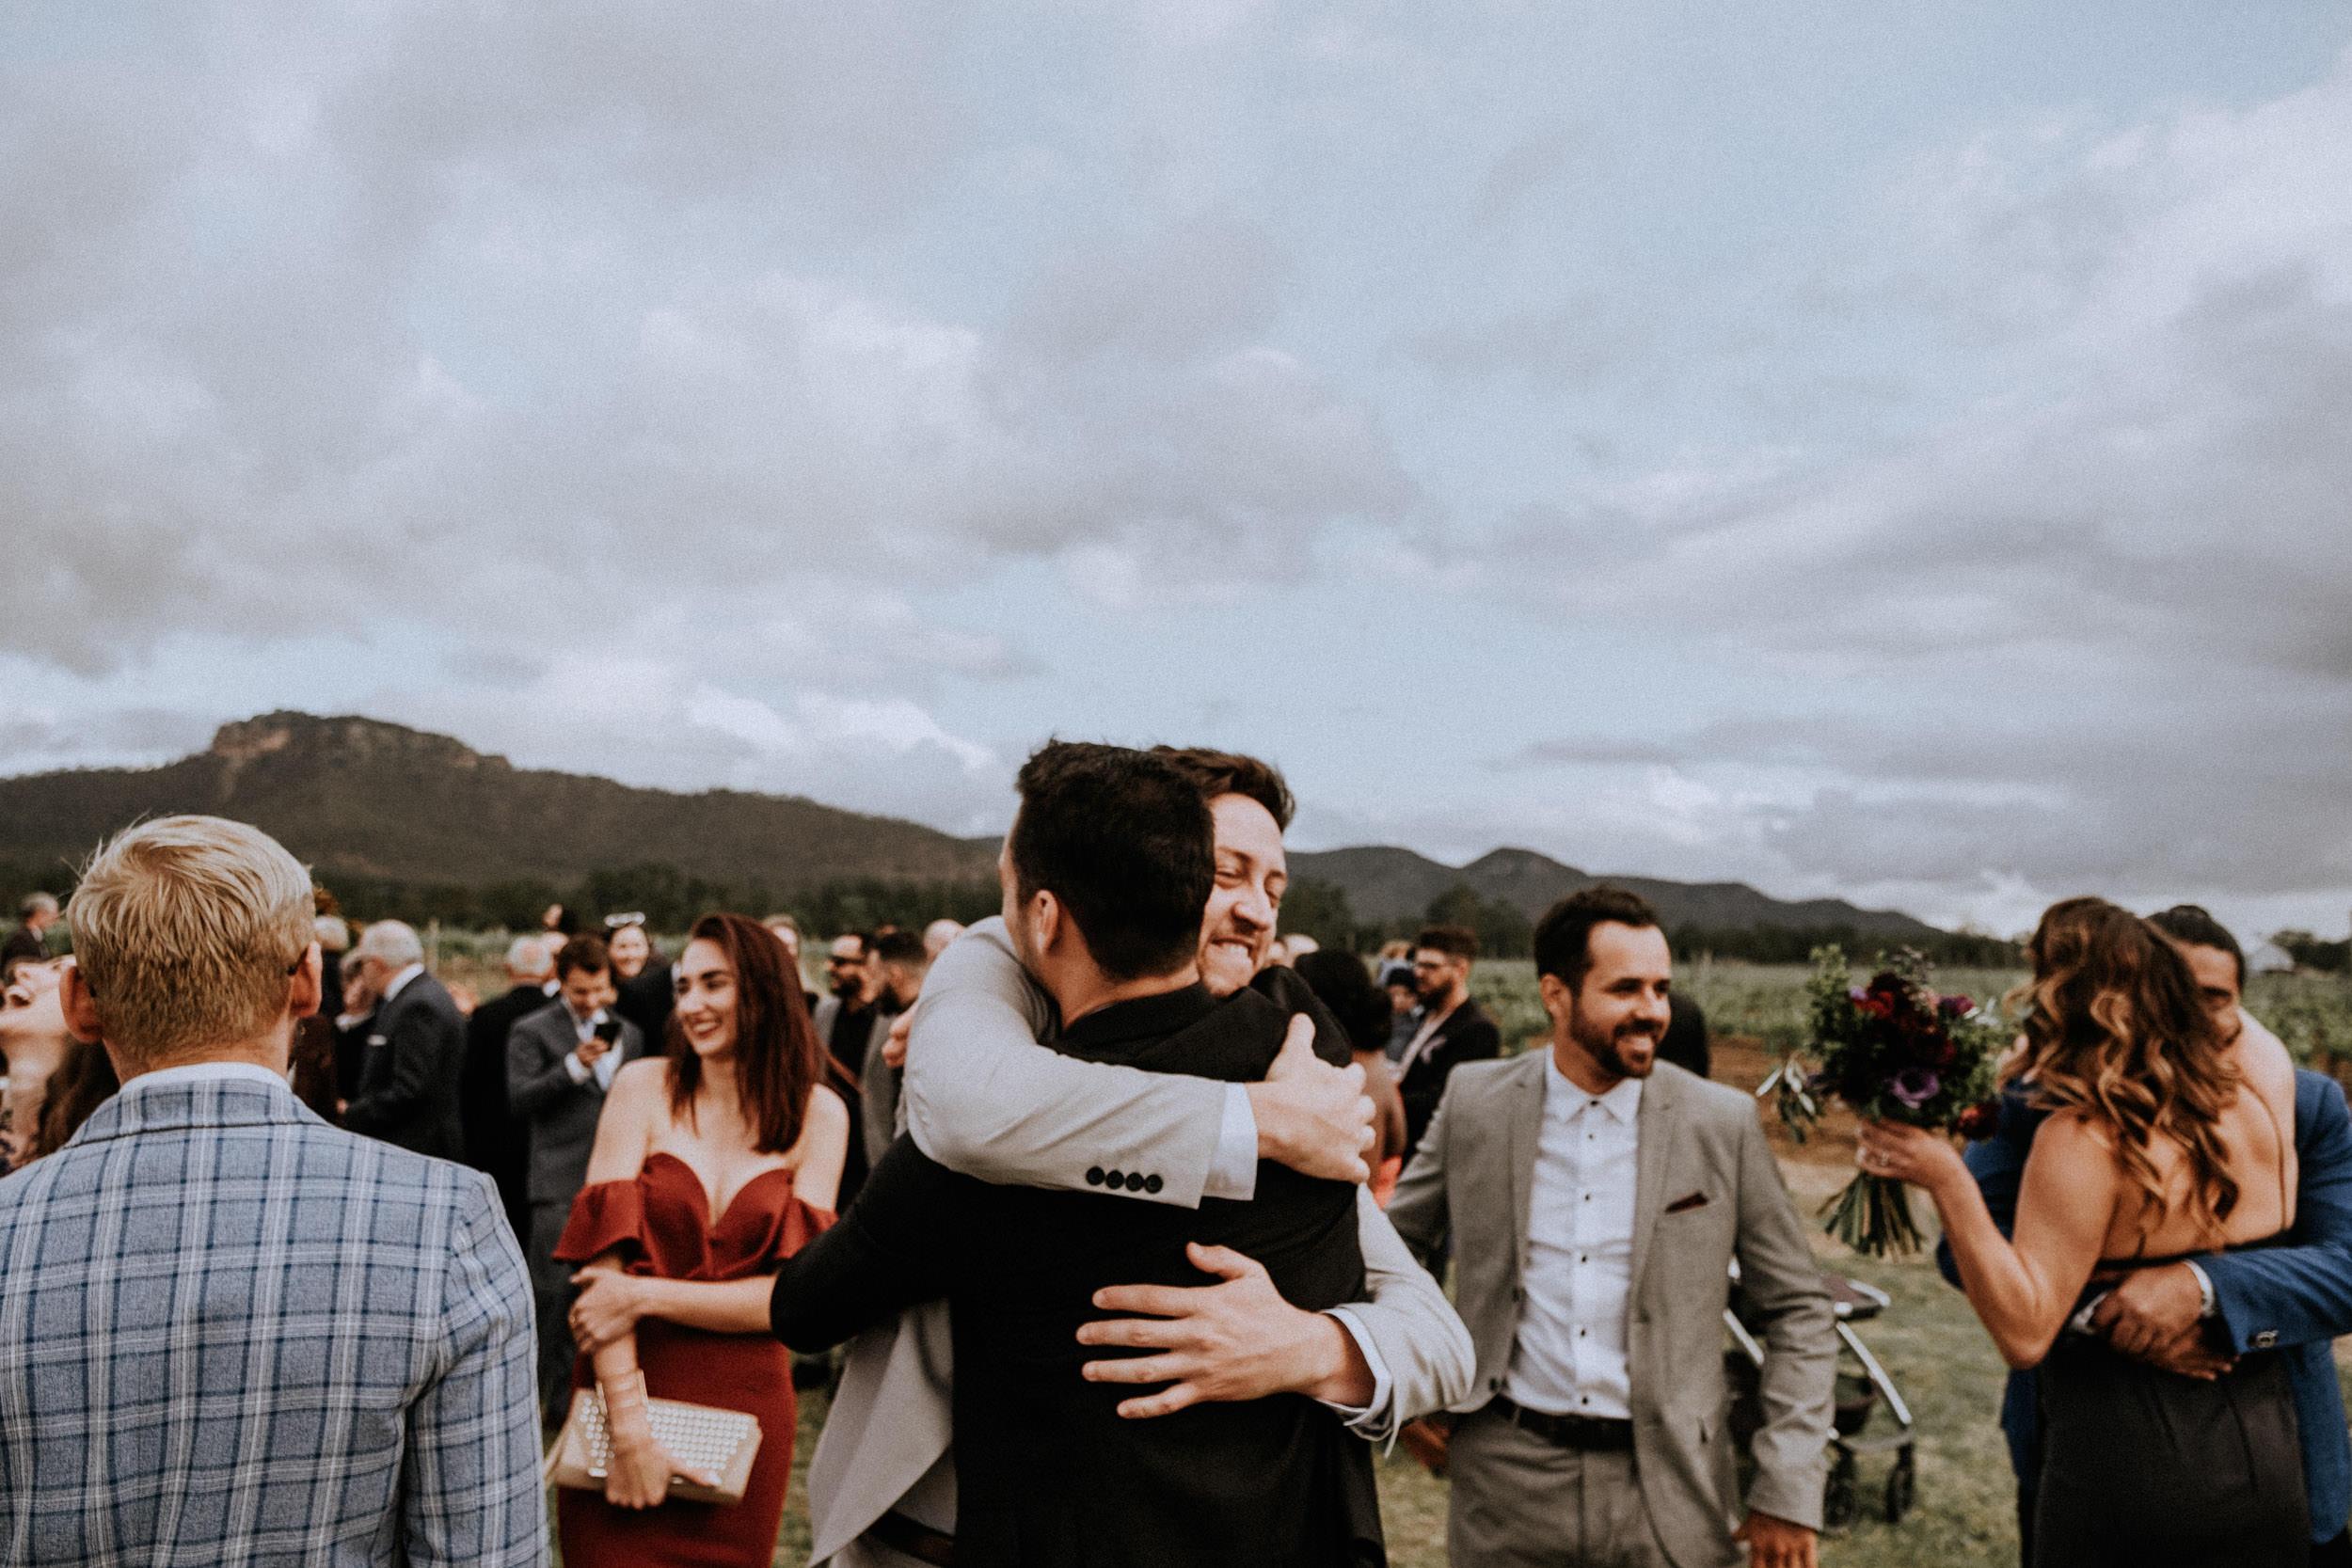 s+j_top_elopement wedding photography_kings & thieves_blog - 339.jpg